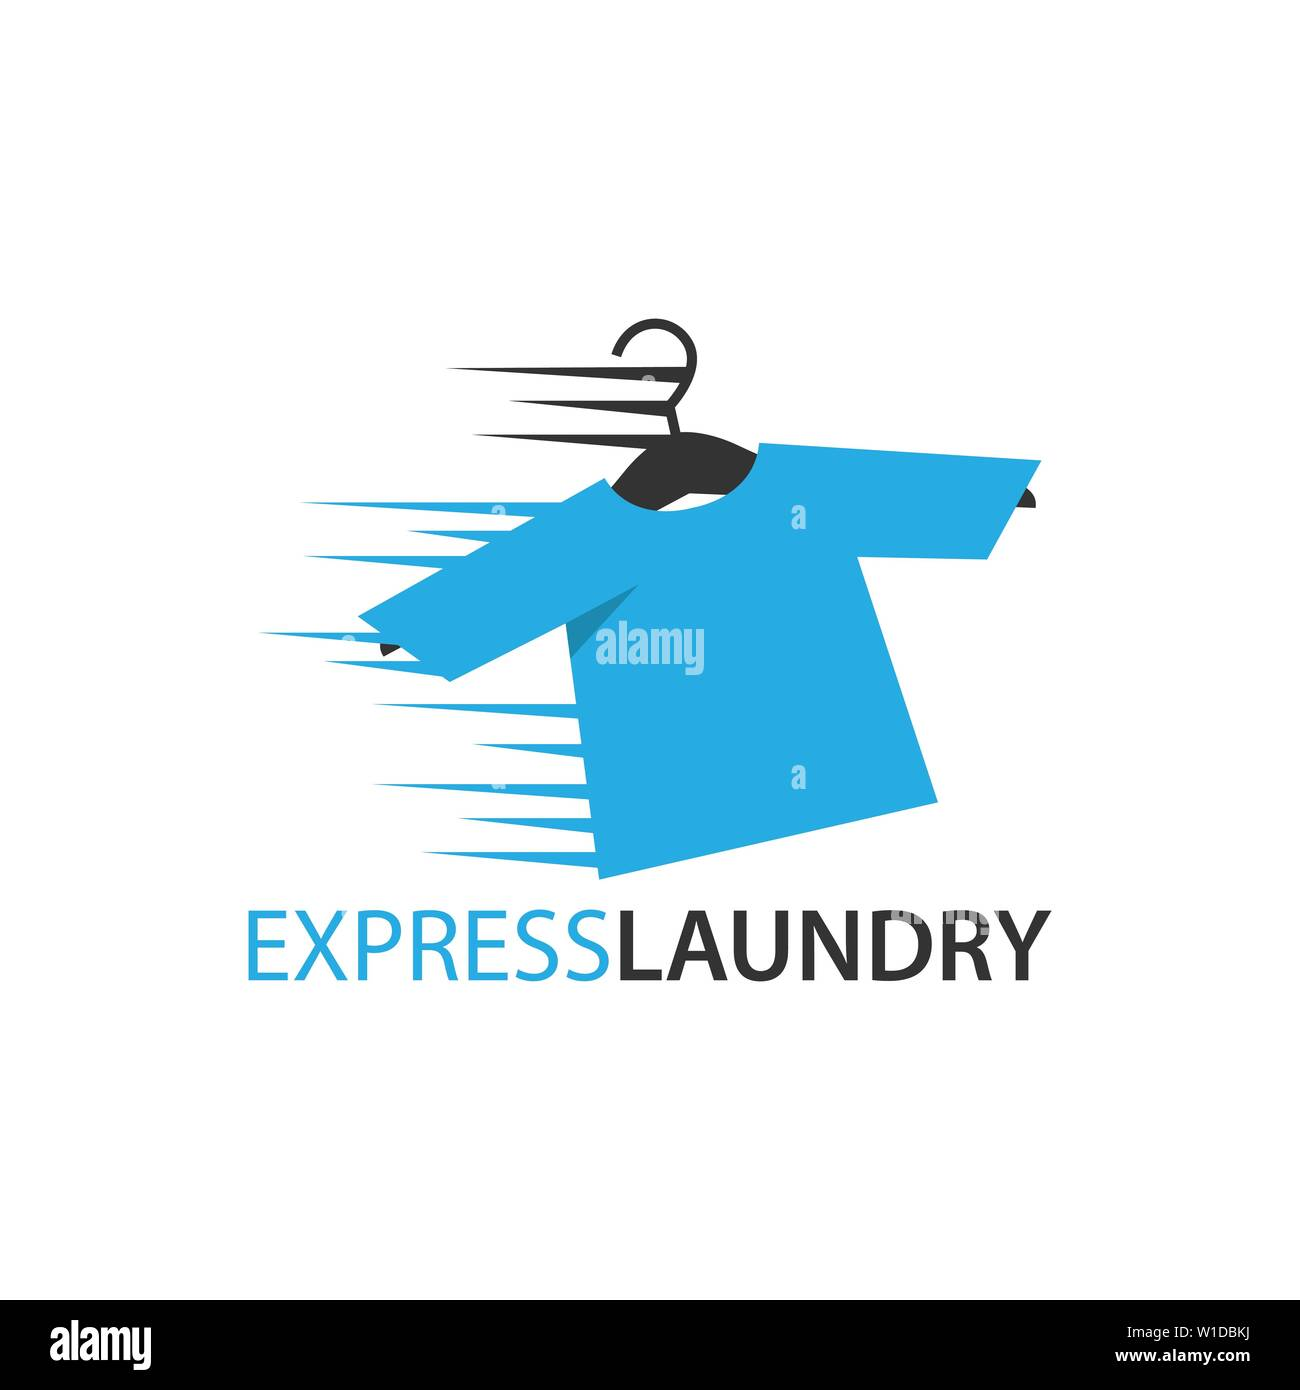 Express dry cleaning icon, laundry flat design logo - Stock Image